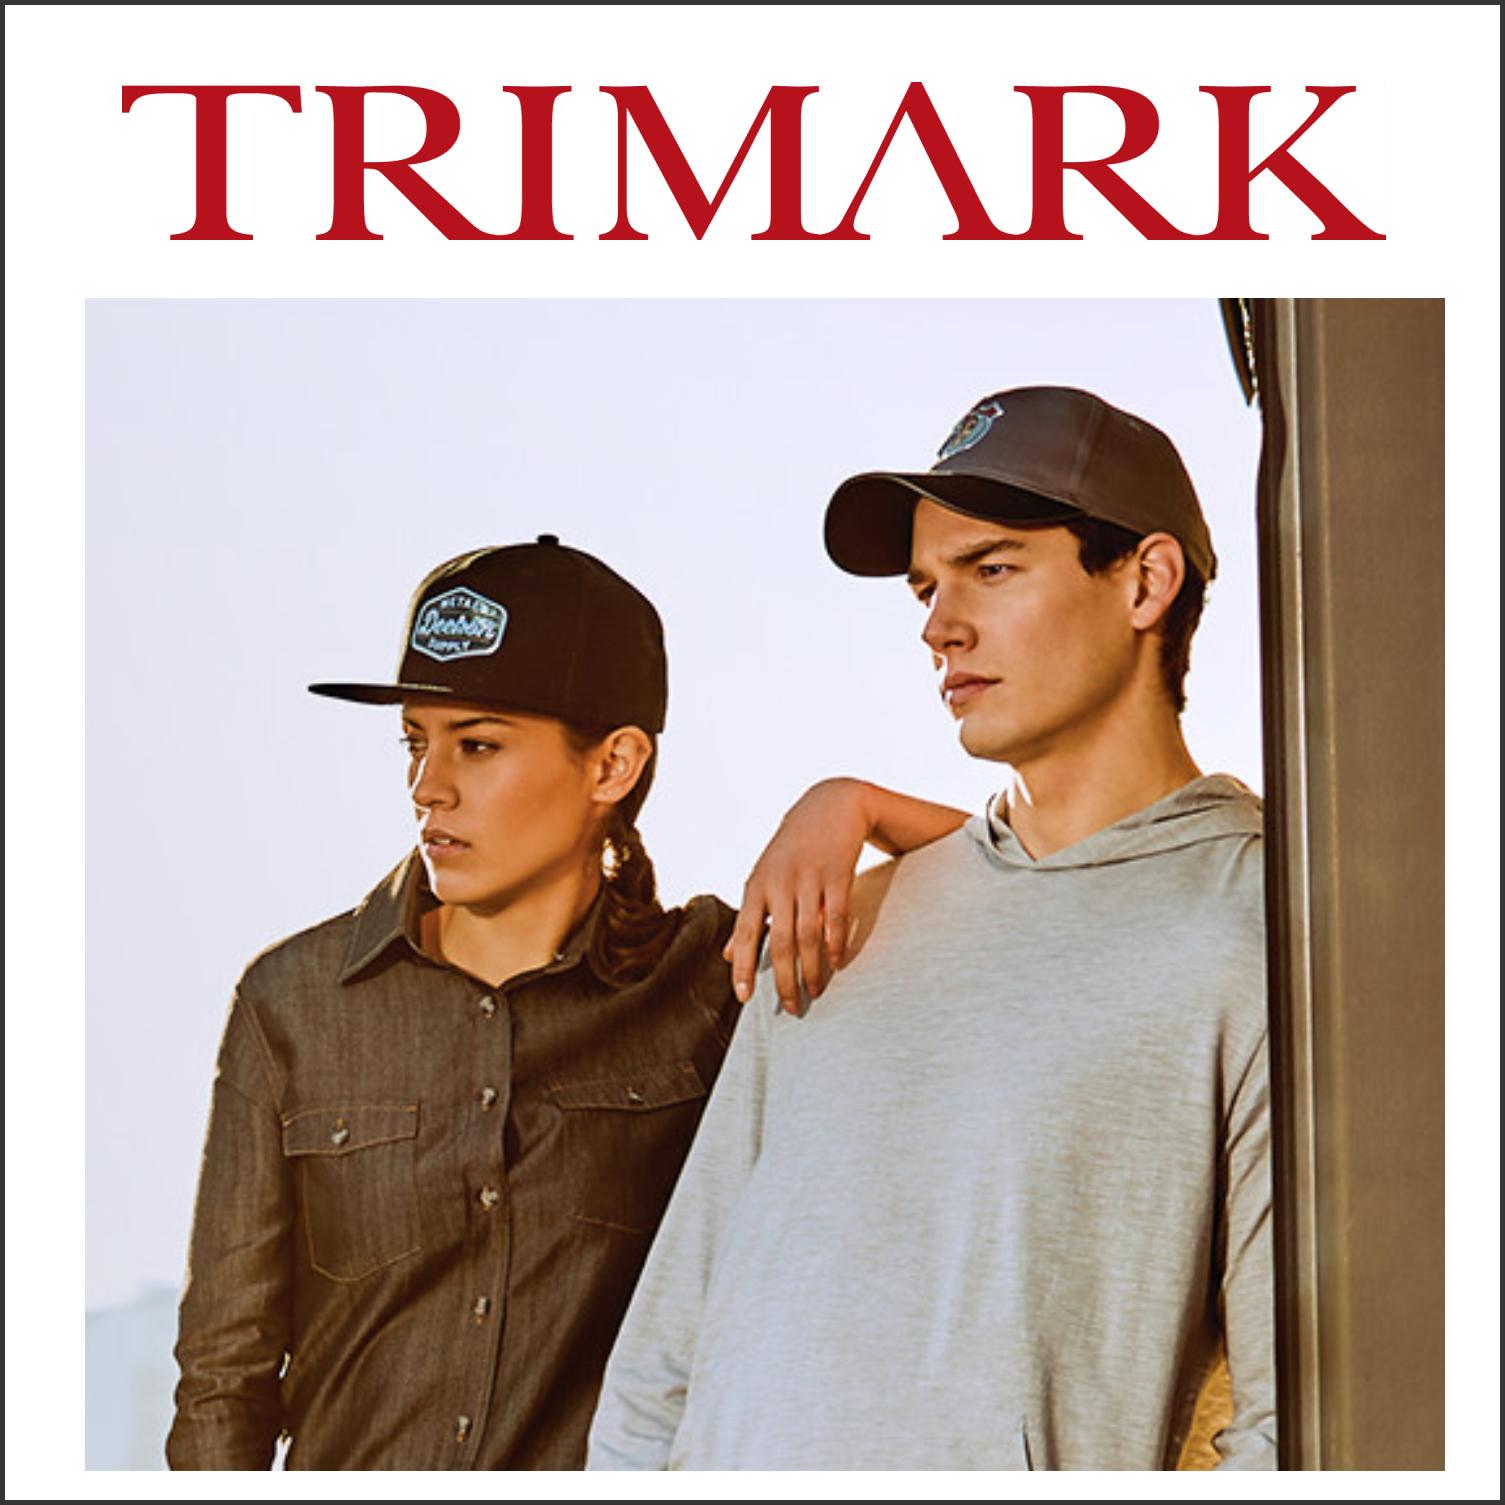 Trimark.png